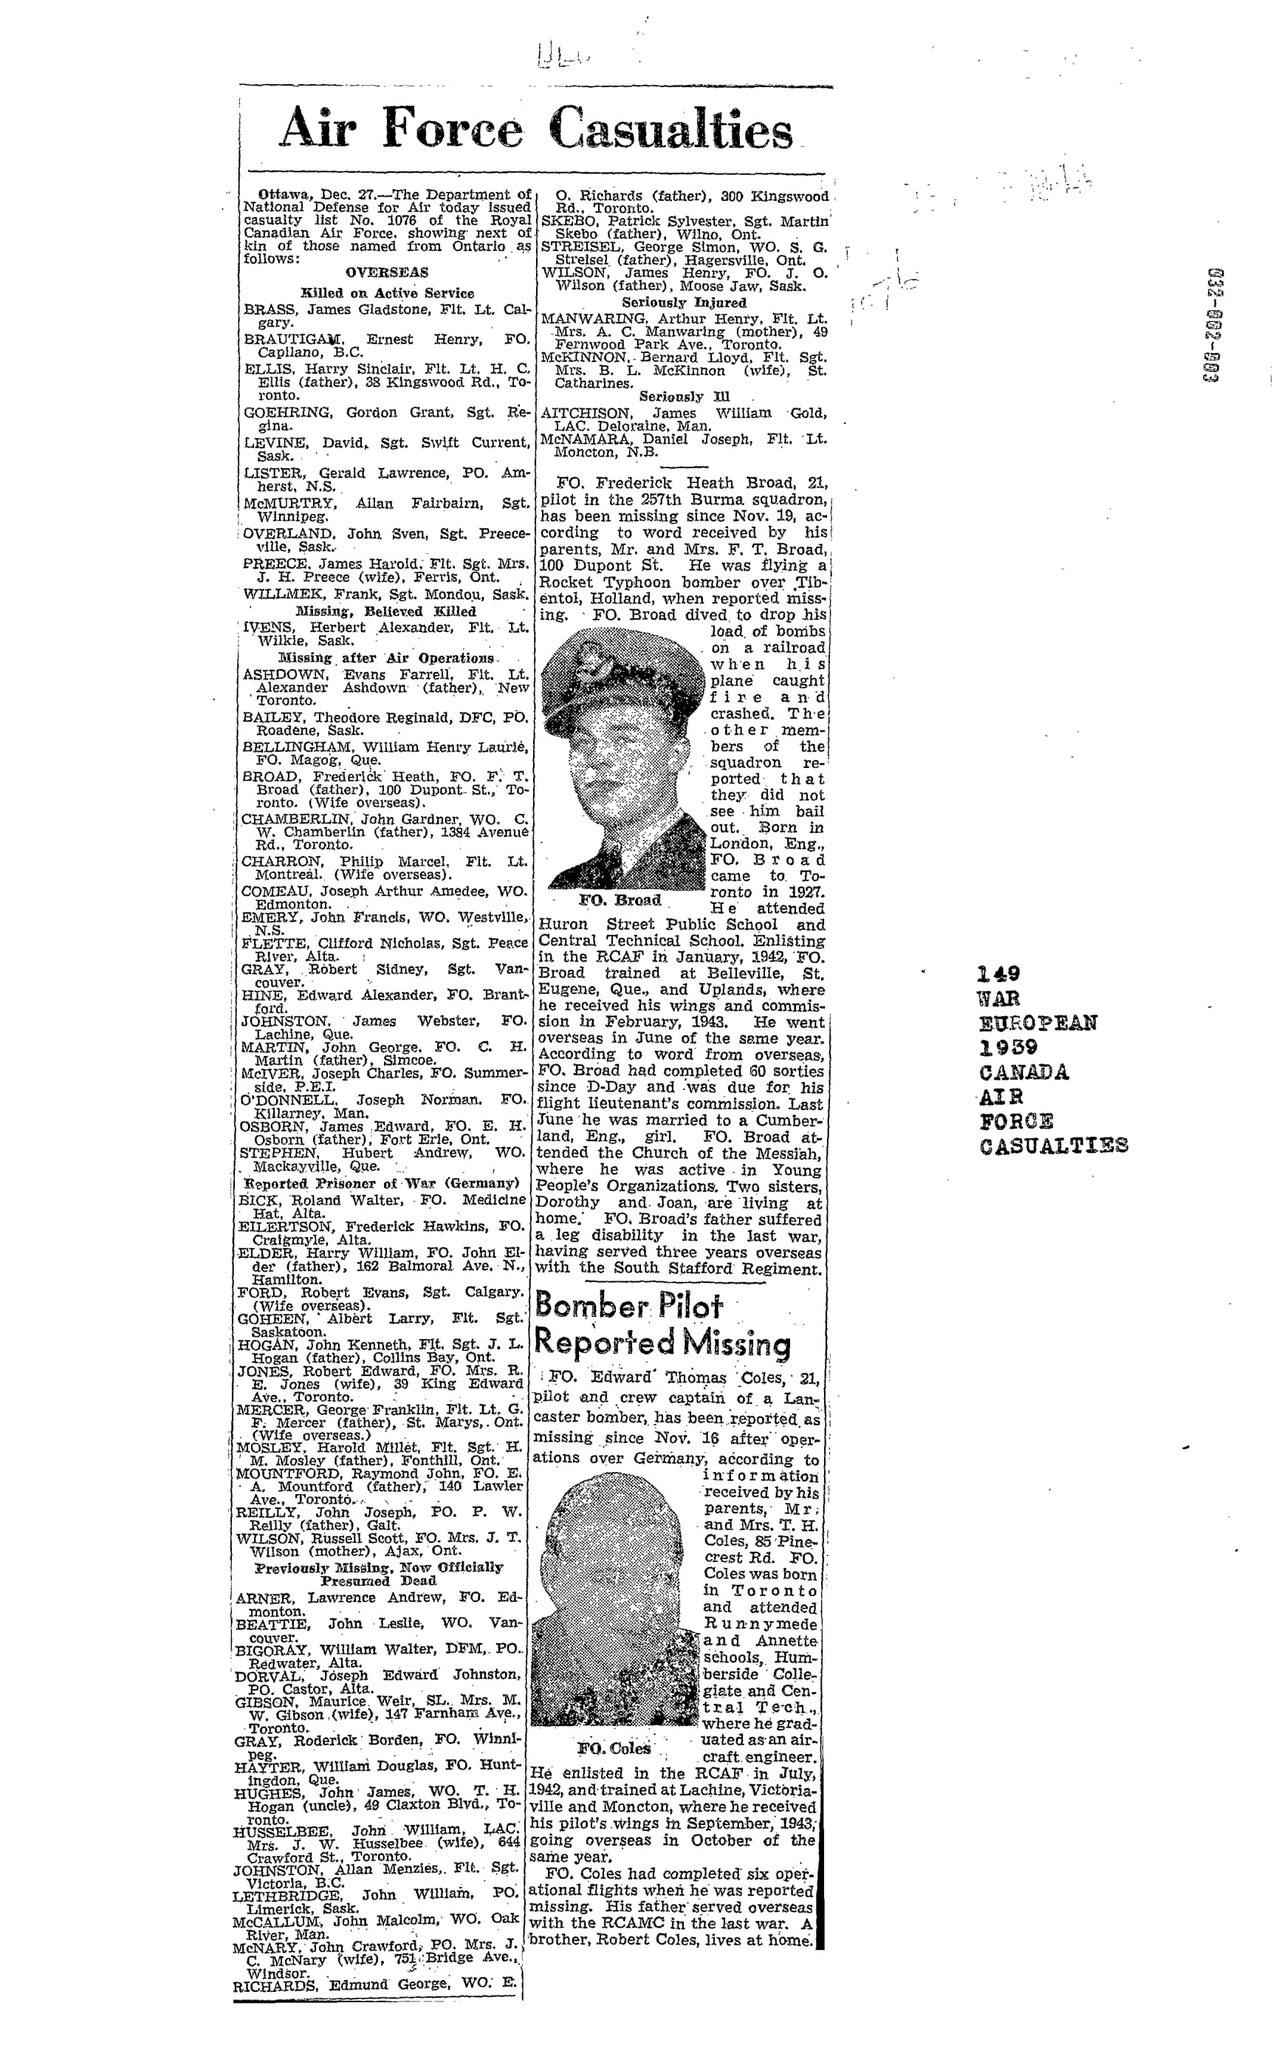 Hamilton Spectator 9-11-1944